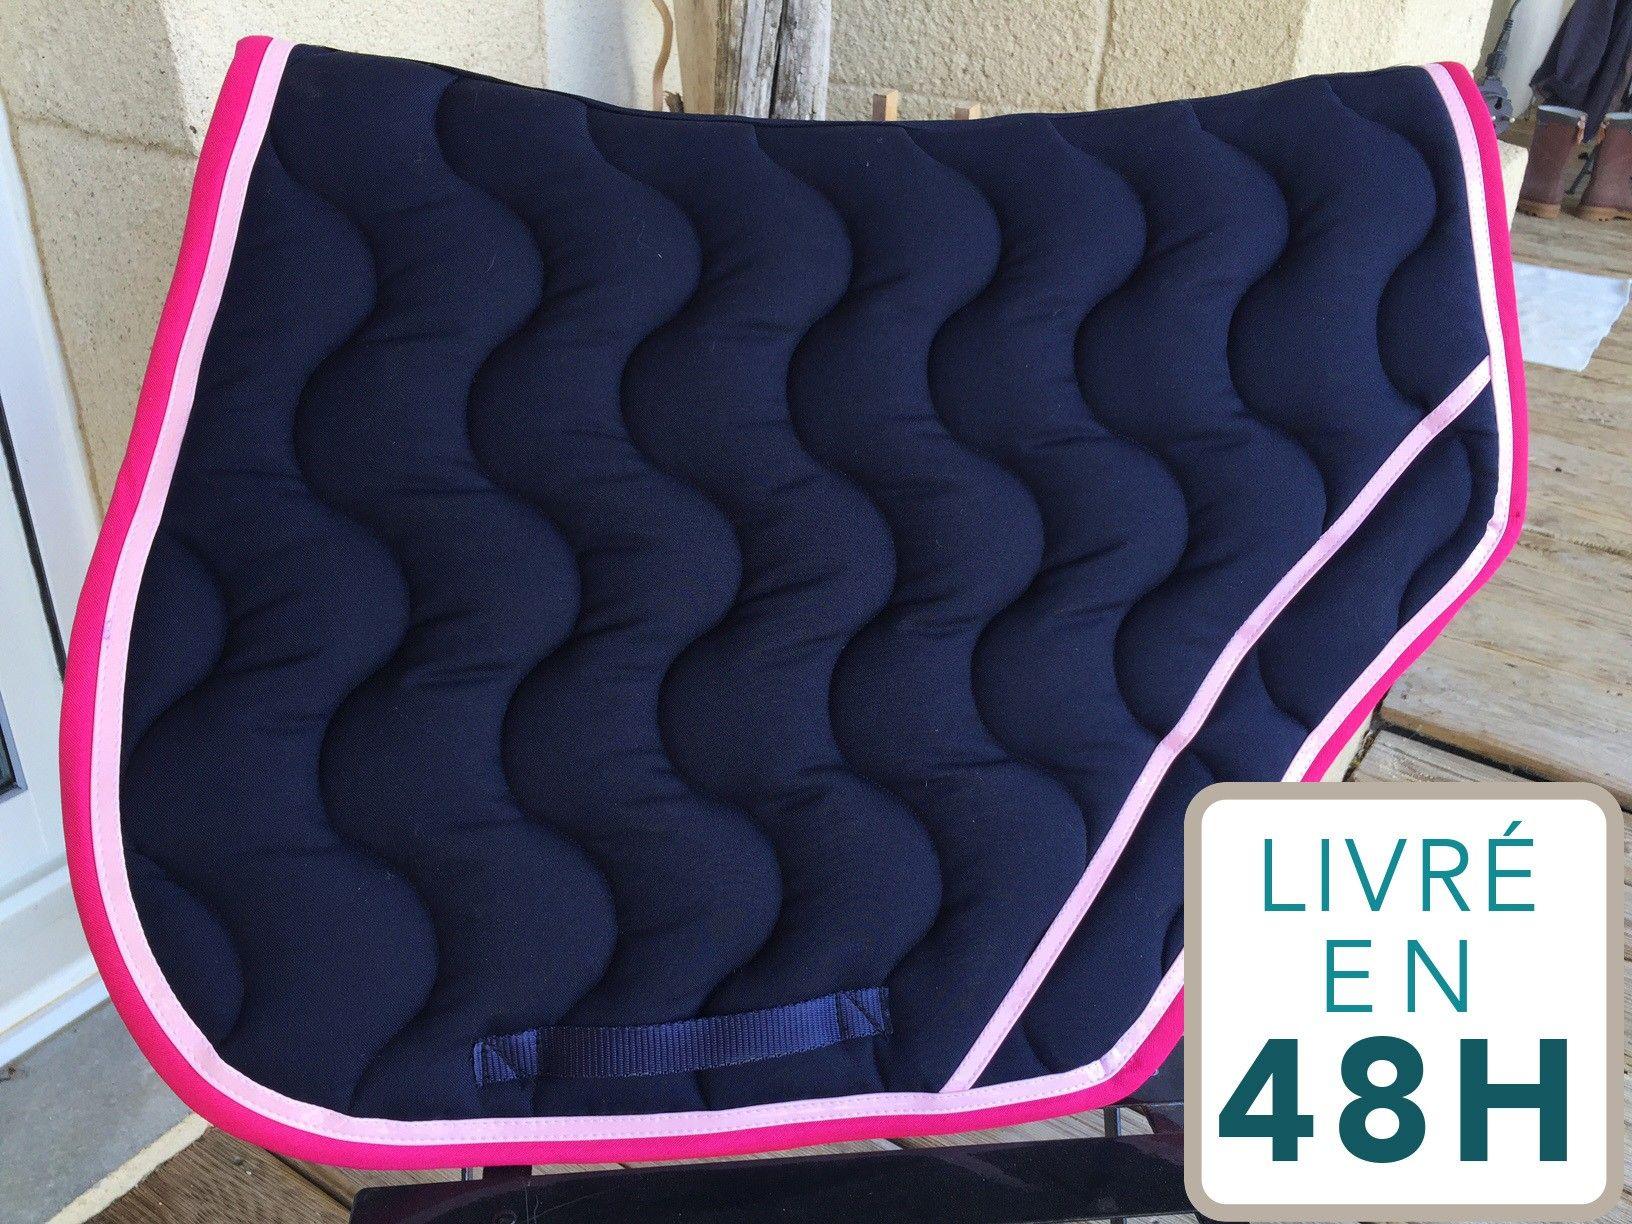 tapis paddock sport marine bord fuchsia tapis paddock pinterest tapis. Black Bedroom Furniture Sets. Home Design Ideas